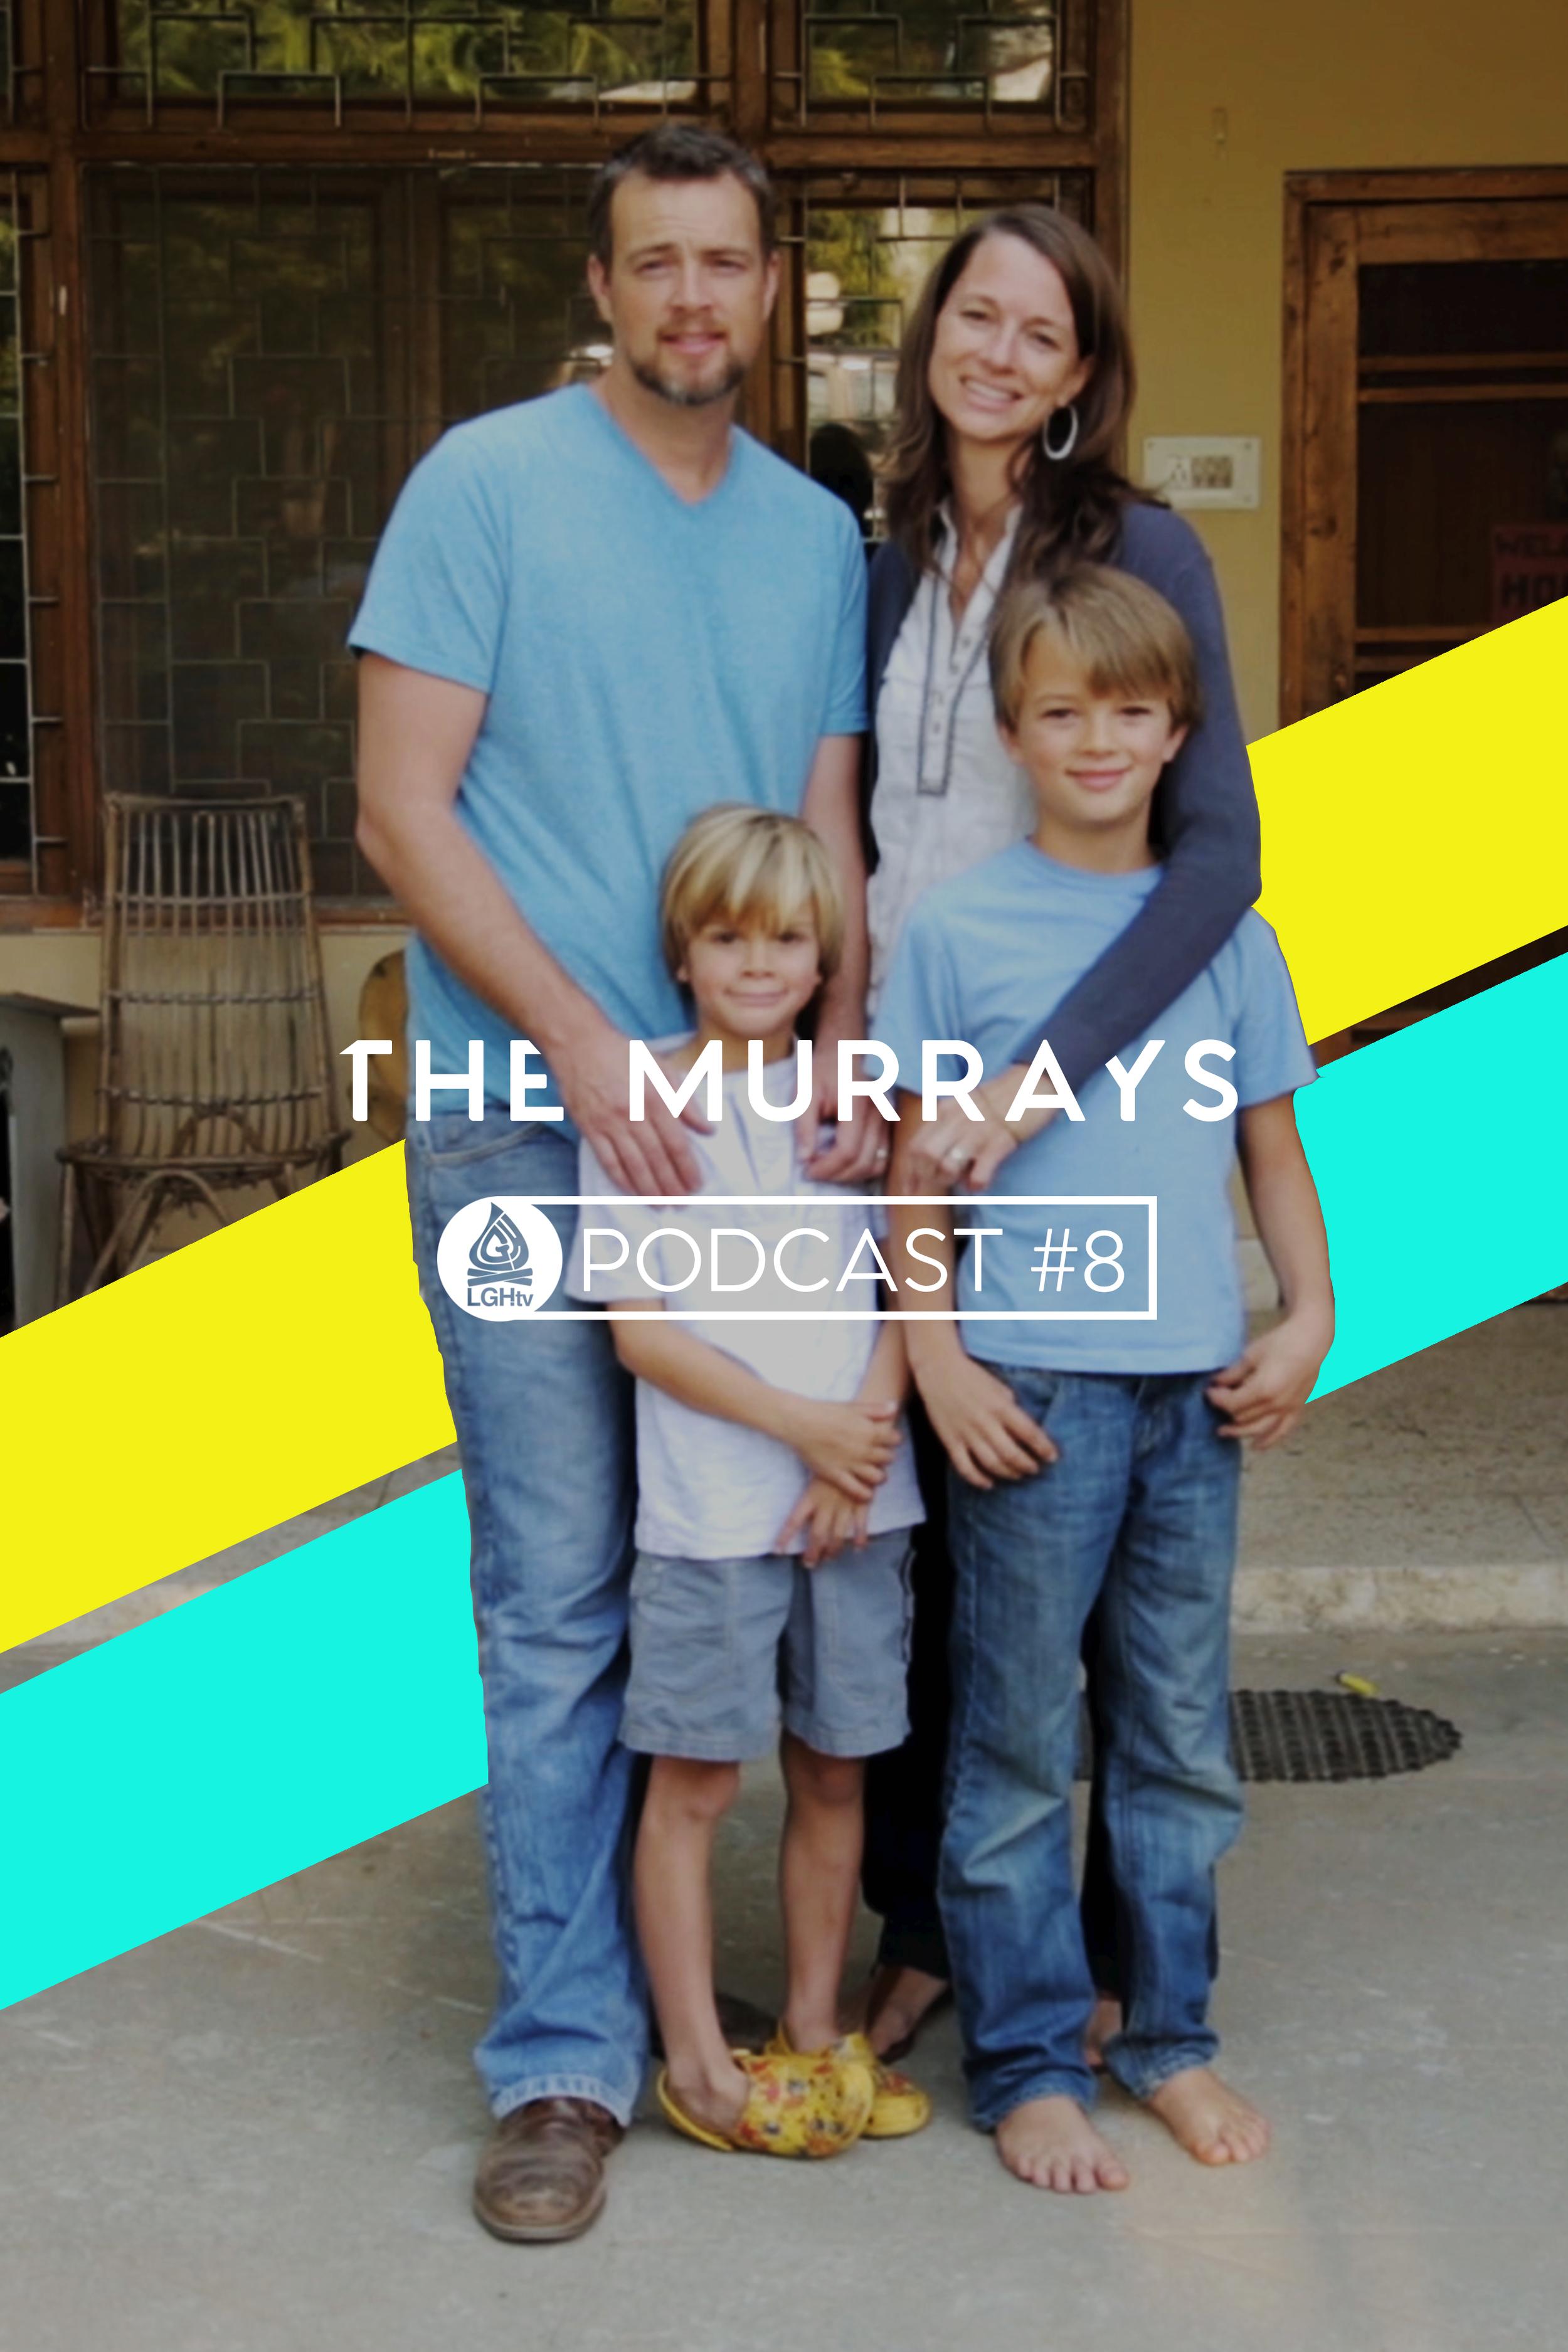 The Murrays